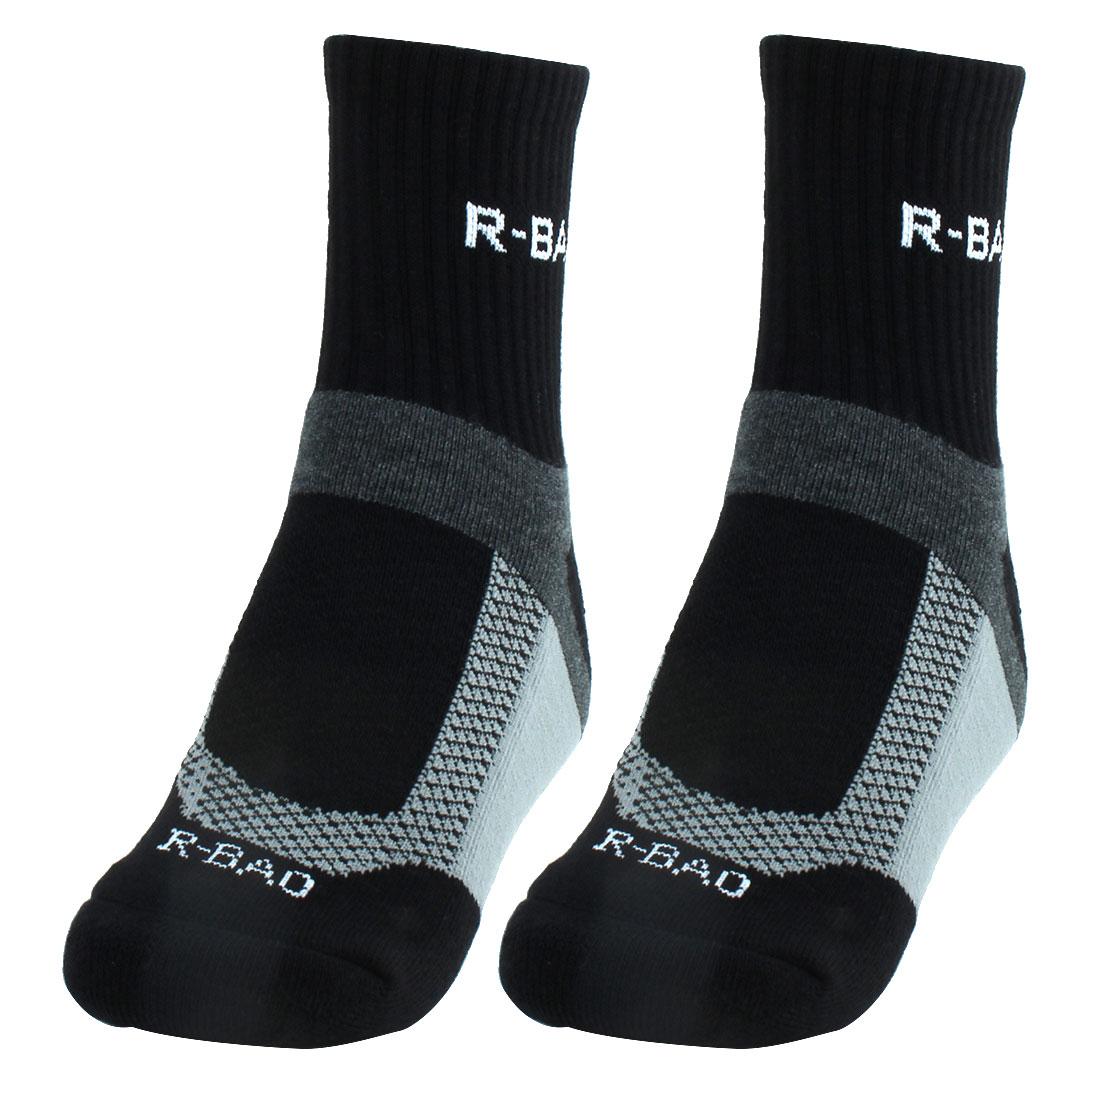 R-BAO Authorized Adult Mountain Bike Workout Training Cycling Socks Black Pair